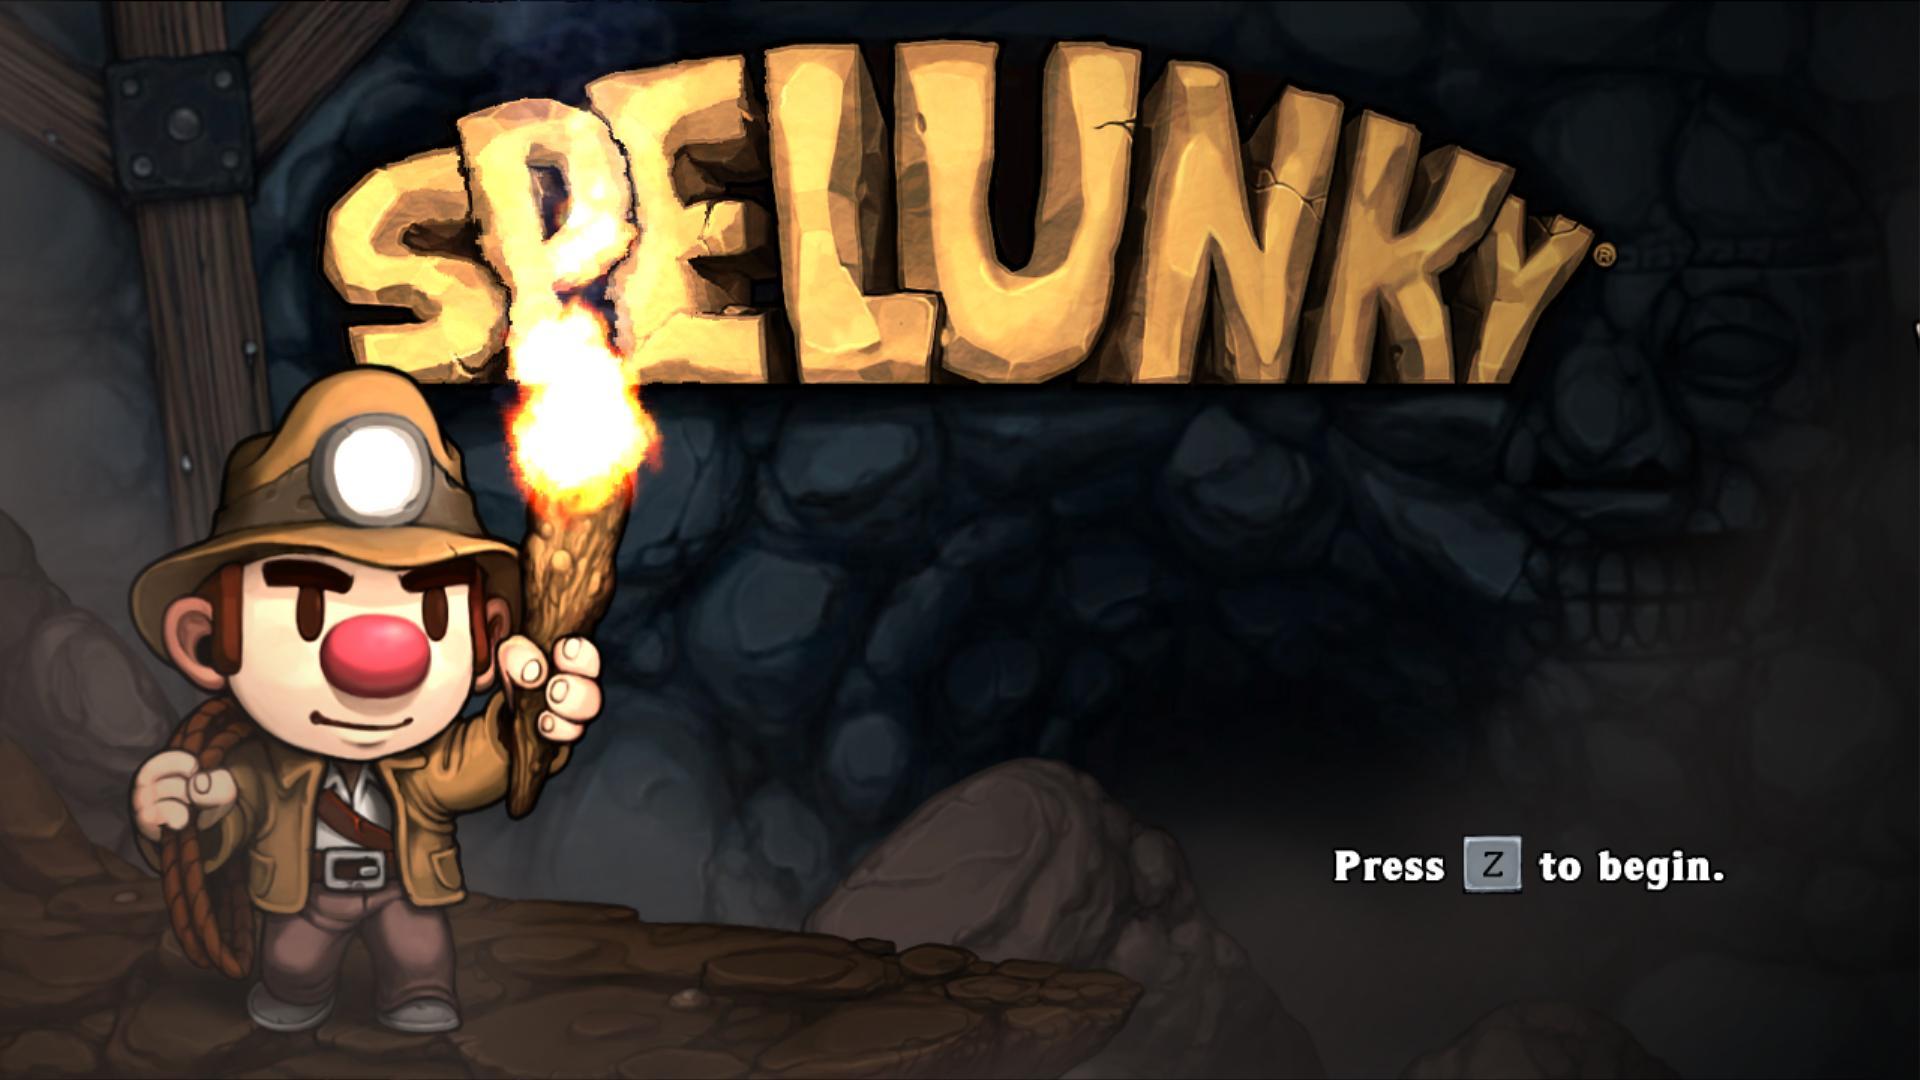 spelunky-2013mac screenshot 1